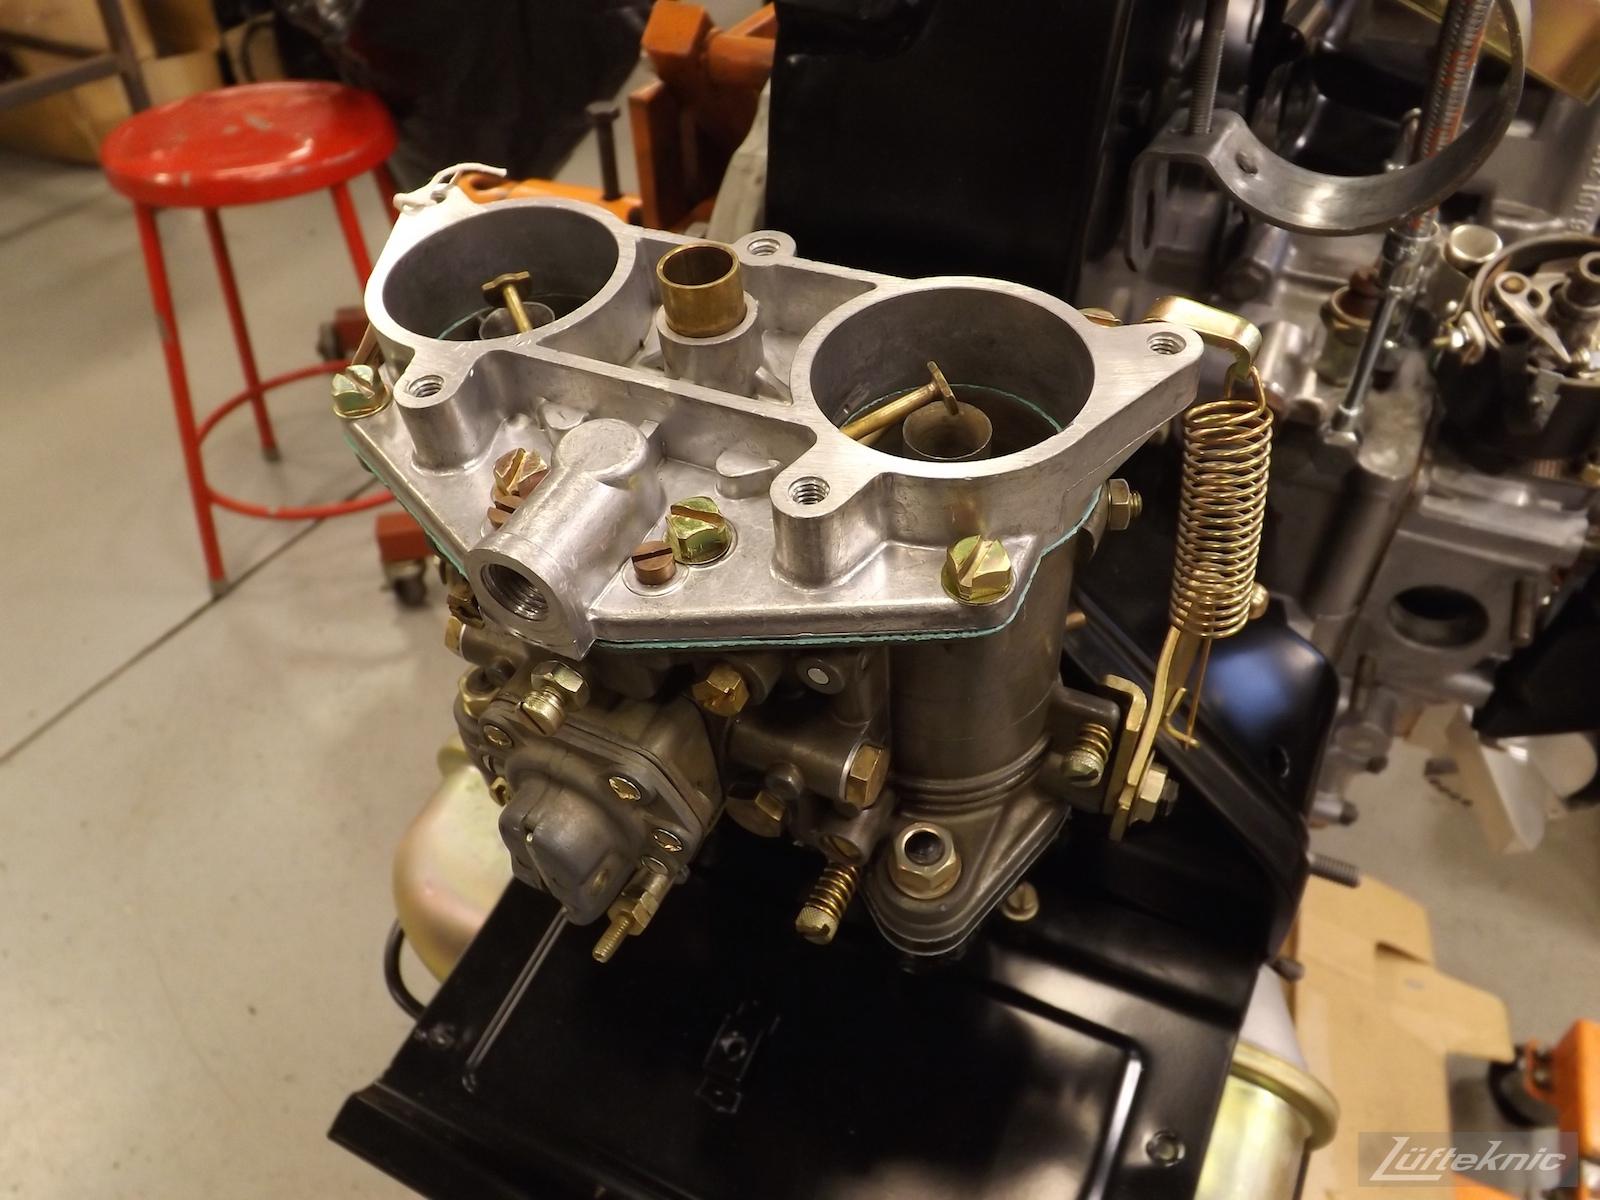 Rebuild carburetors for an Irish Green Porsche 912 undergoing restoration at Lufteknic.